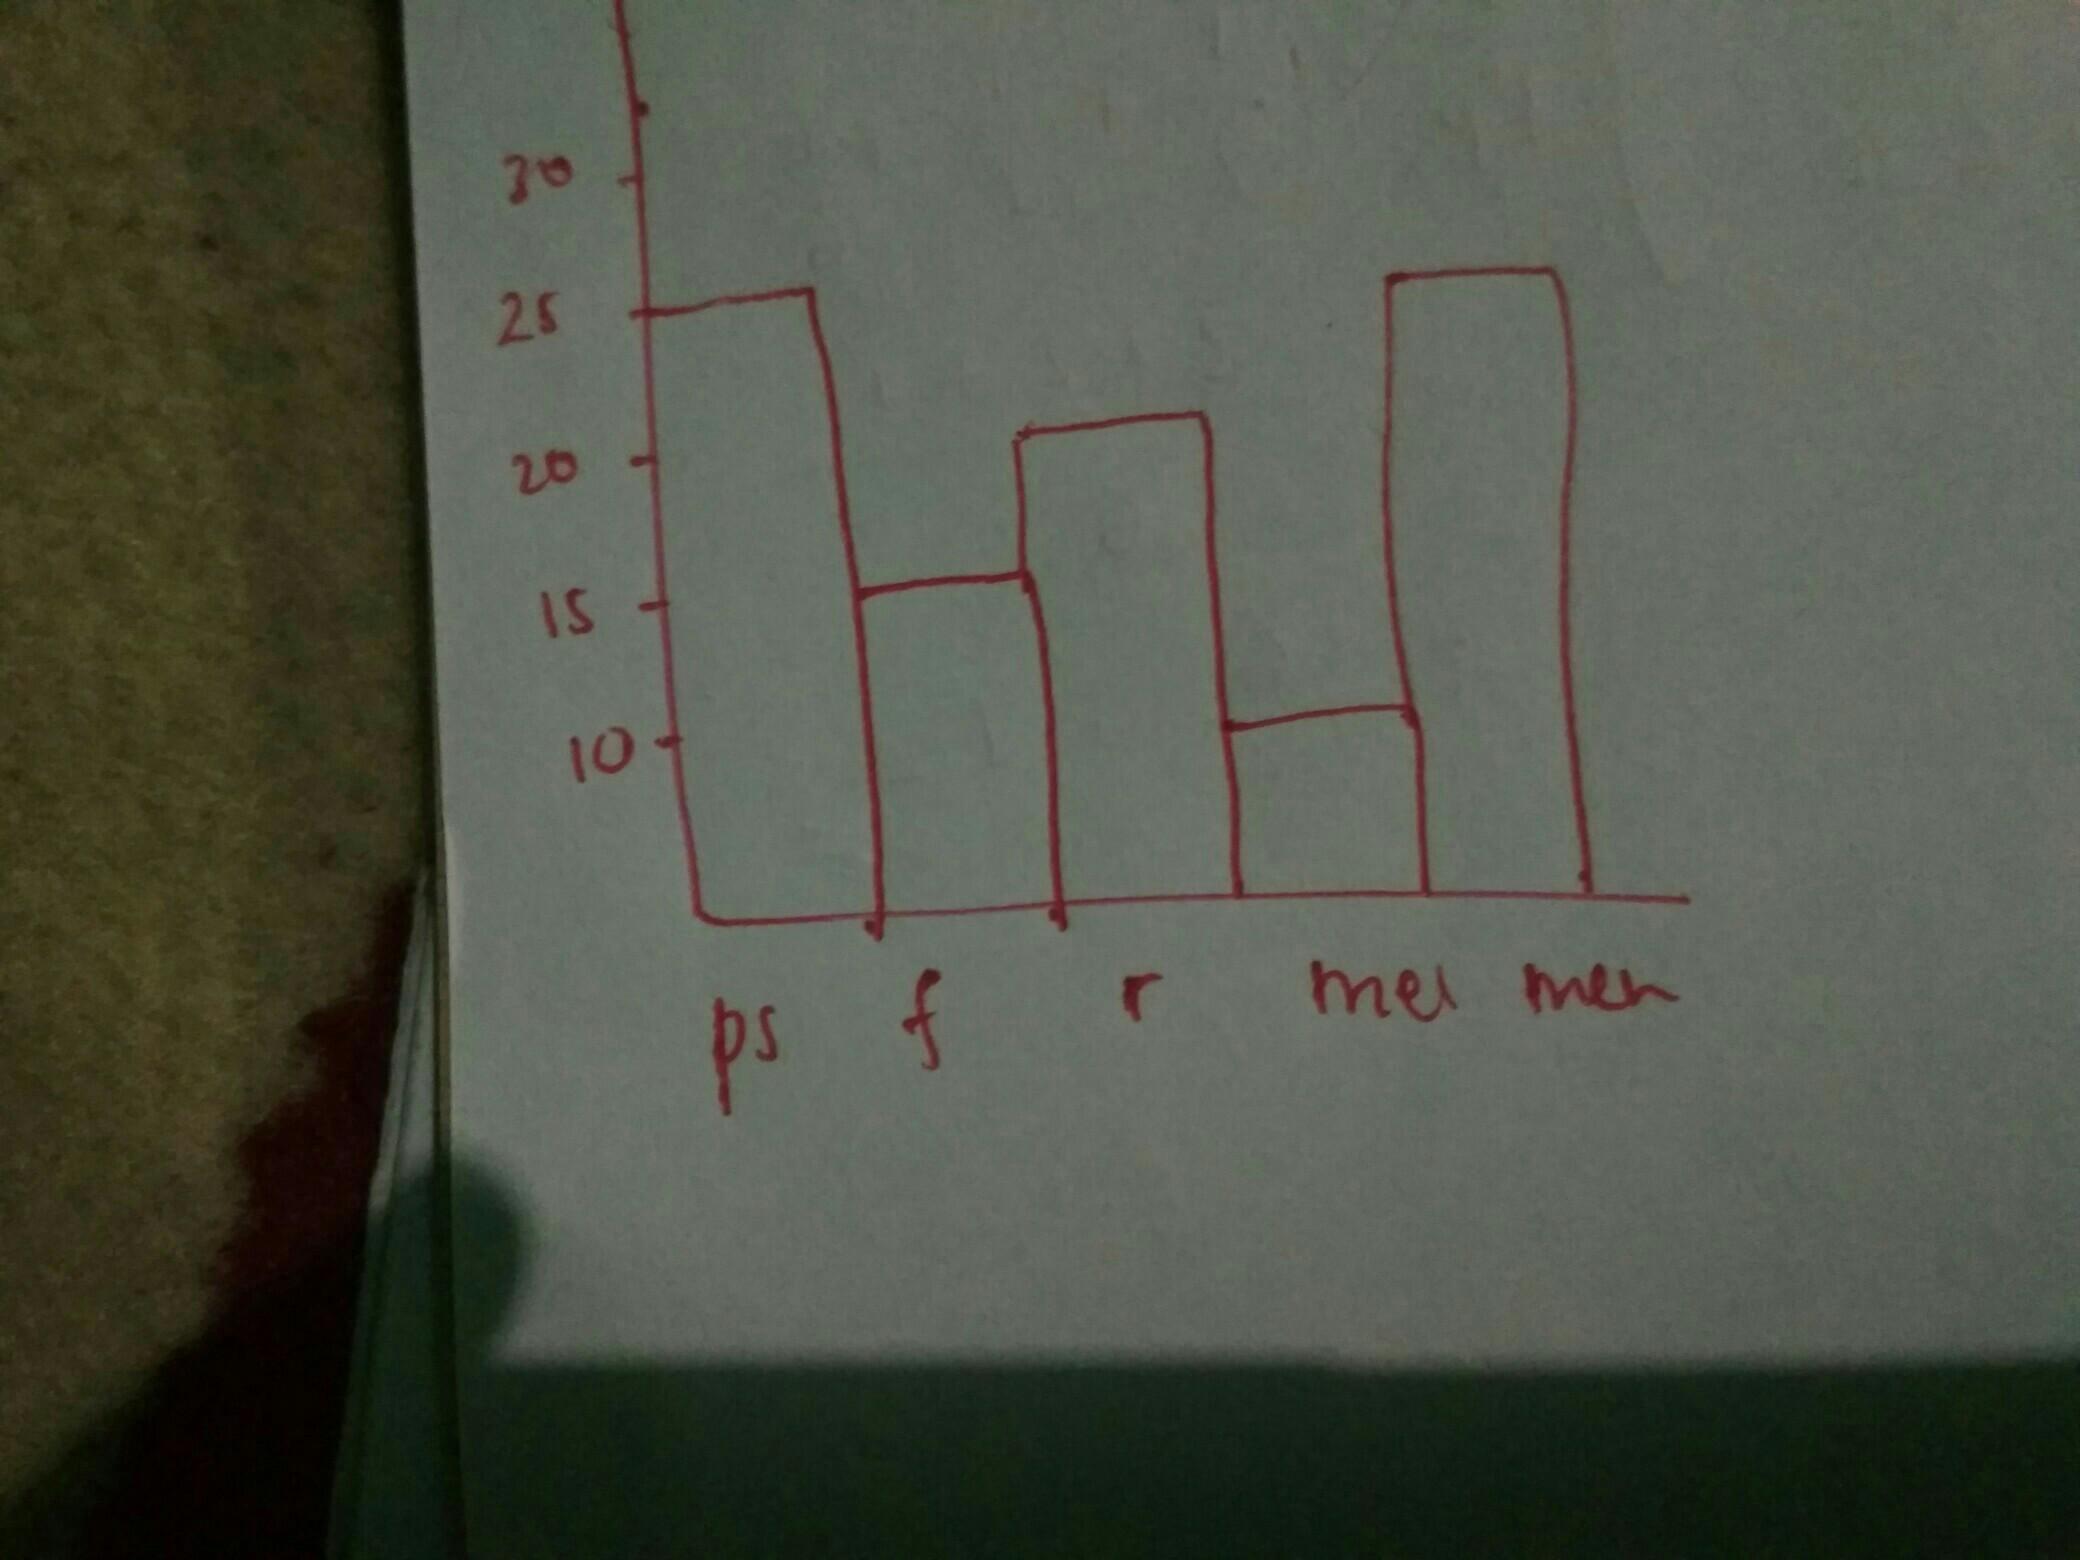 Diagram Batang Yang Sesuai Dengan Data Tersebut Adalah ...